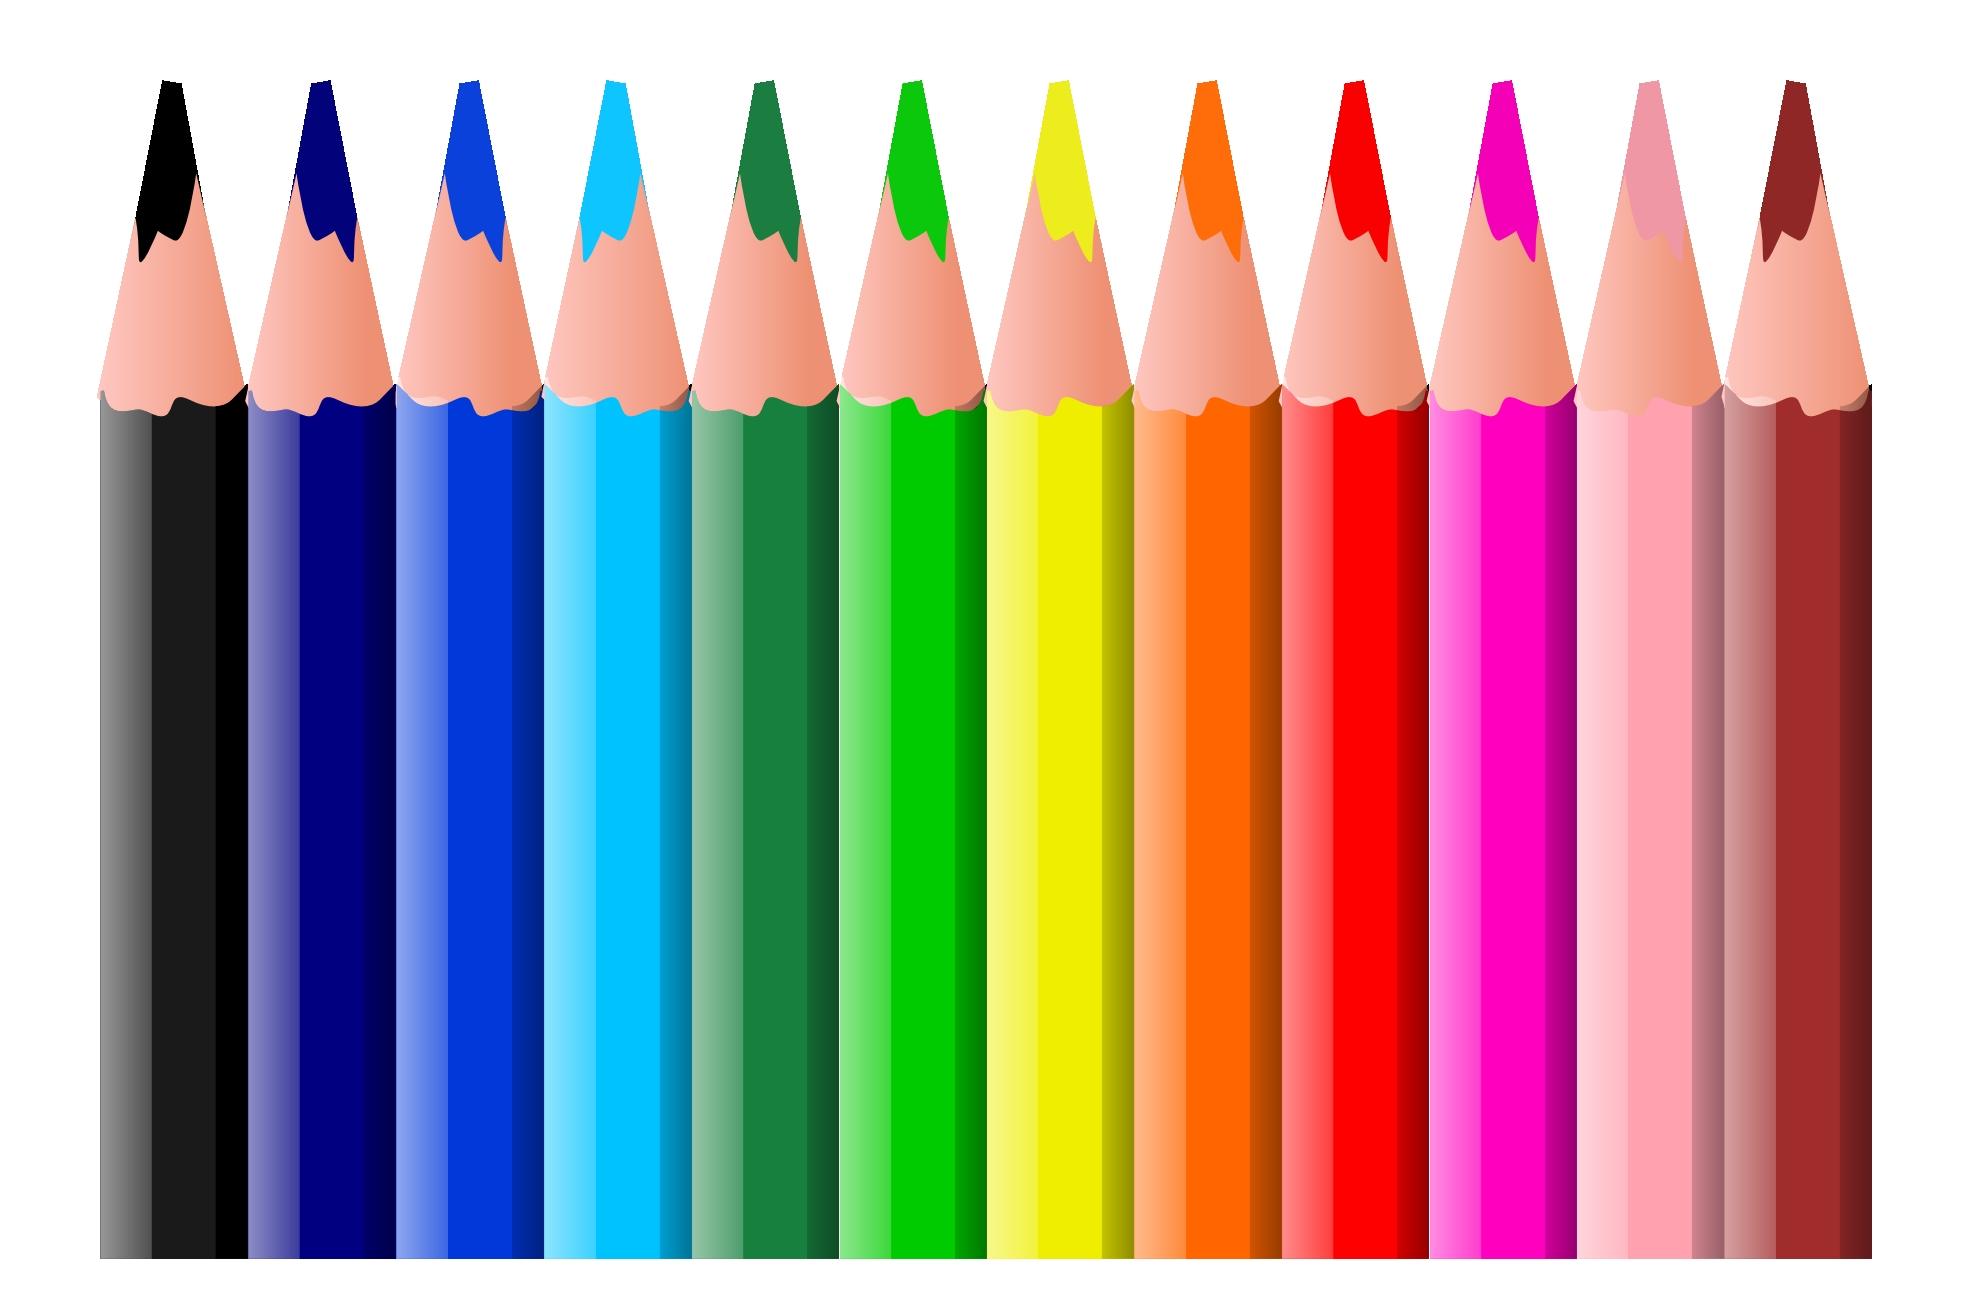 Crayon clipart marker. Clip art for school